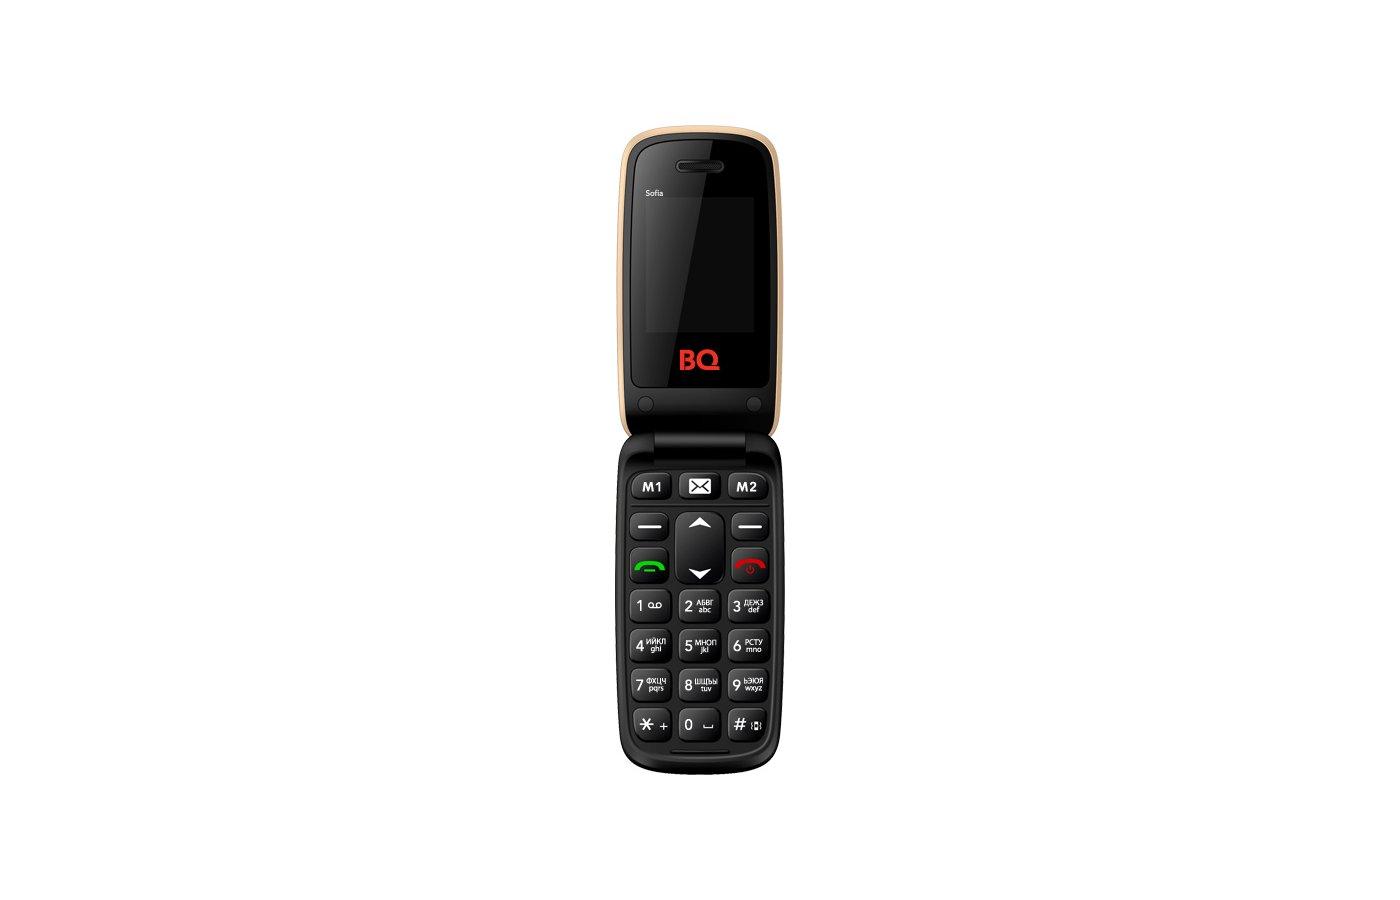 Мобильный телефон BQ BQM-2001 Sofia Gold